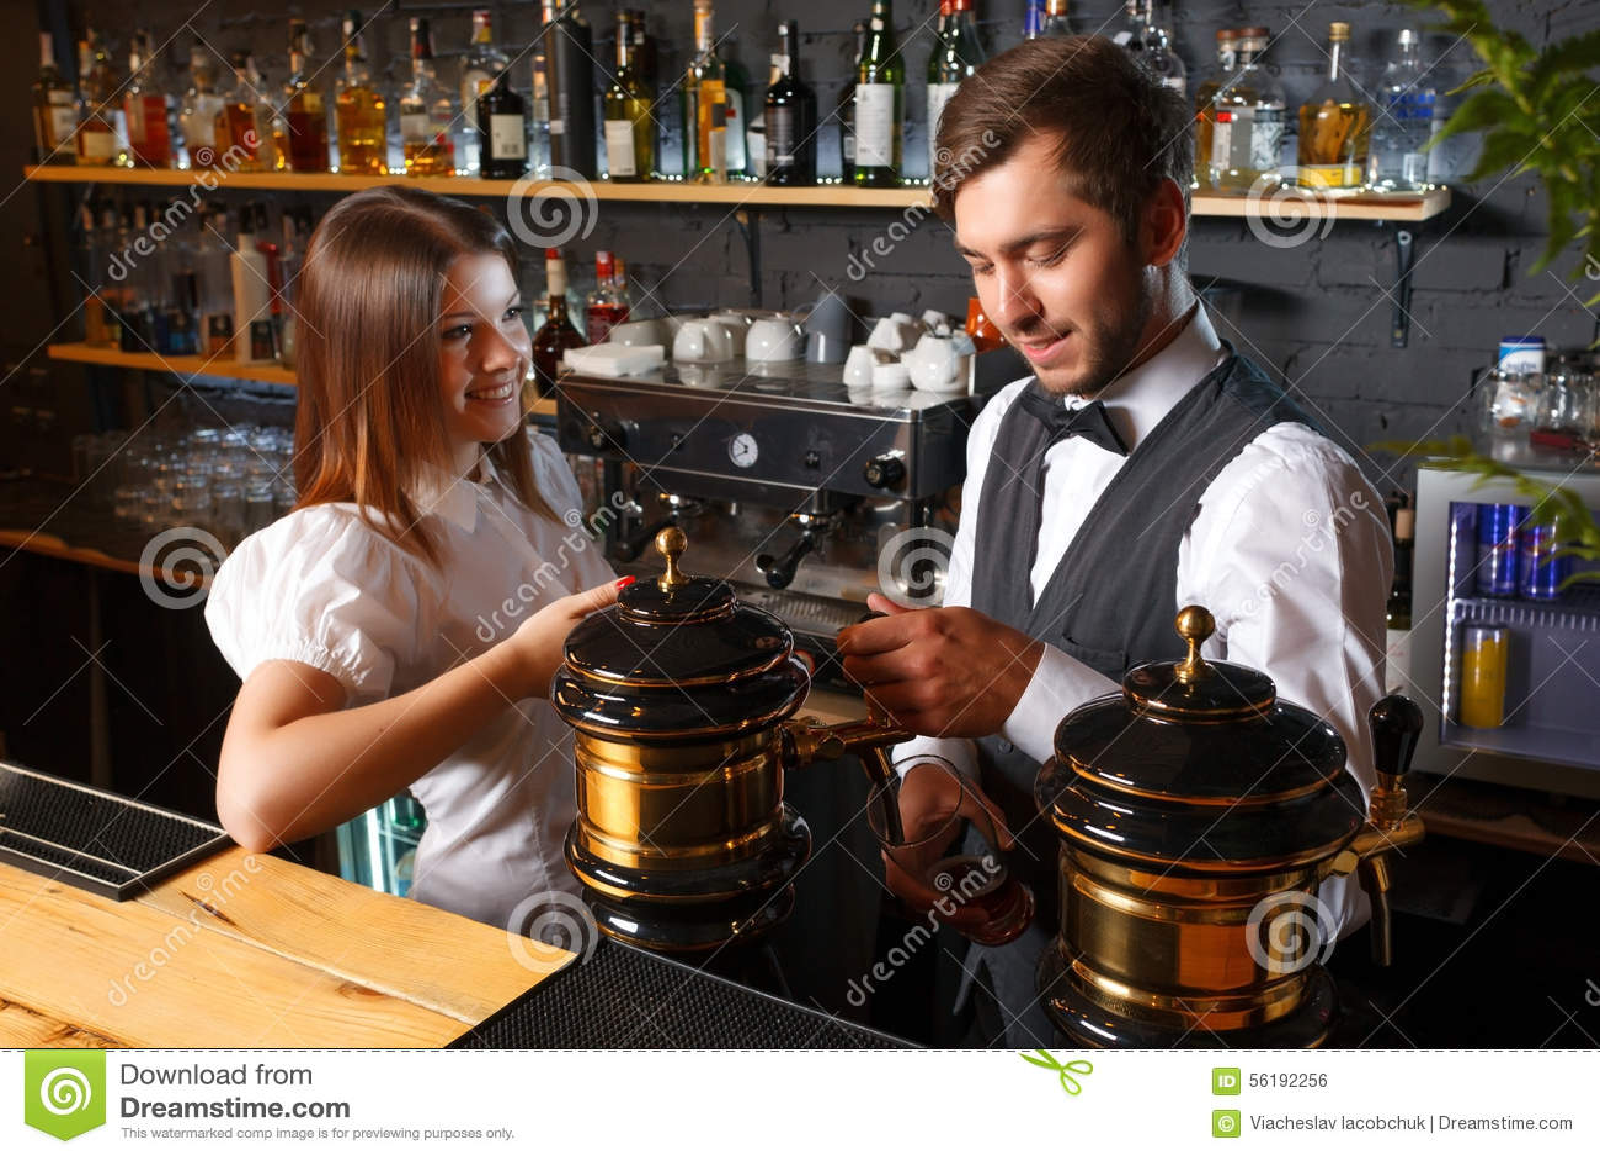 Секс официантка и бармен